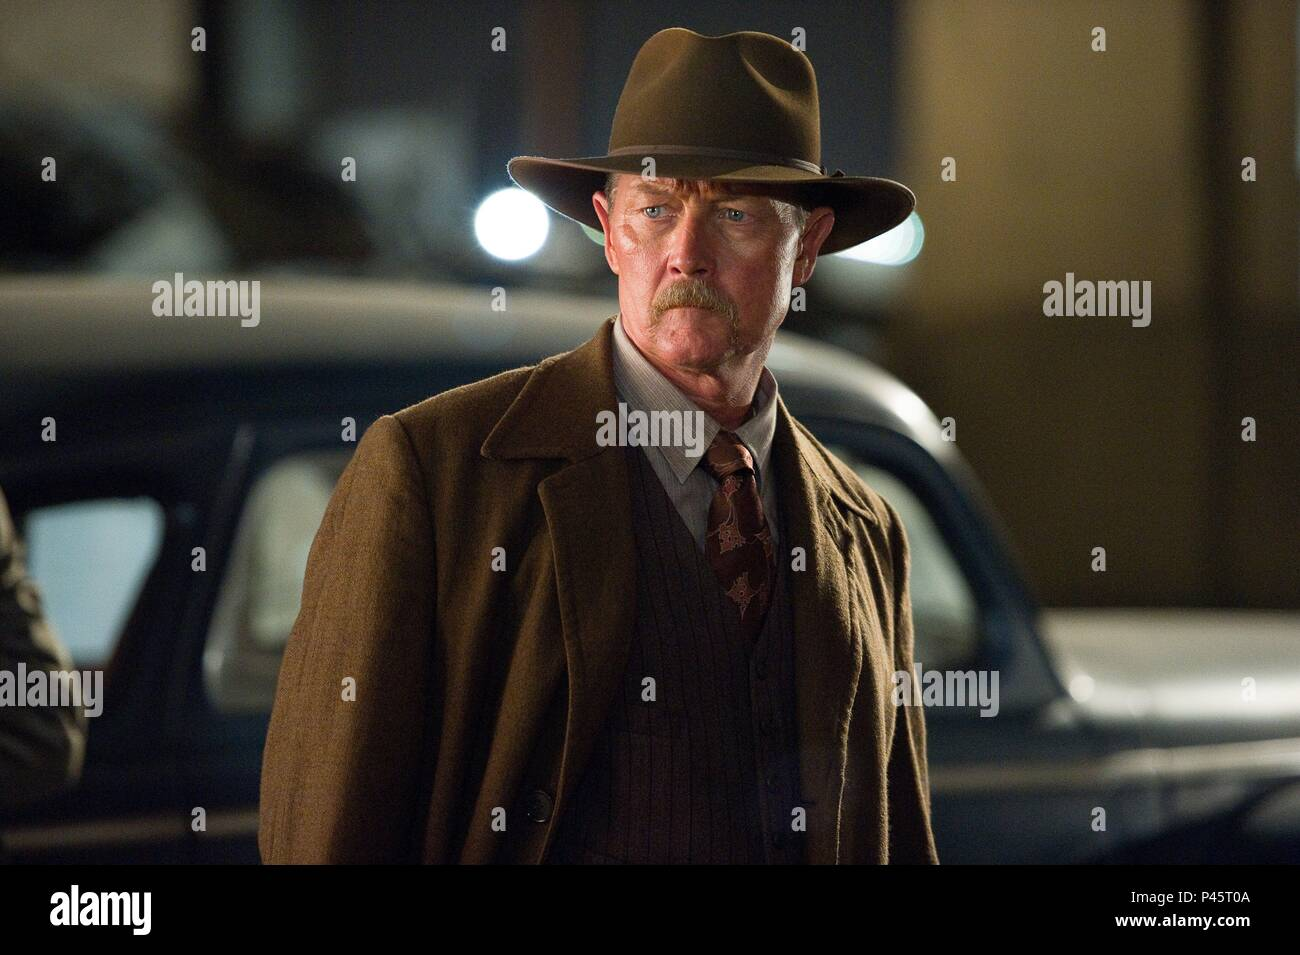 Original Film Title: GANGSTER SQUAD.  English Title: GANGSTER SQUAD.  Film Director: RICHARD FLEISCHER.  Year: 2013.  Stars: ROBERT PATRICK. Credit: VILLAGE ROADSHOW / Album - Stock Image